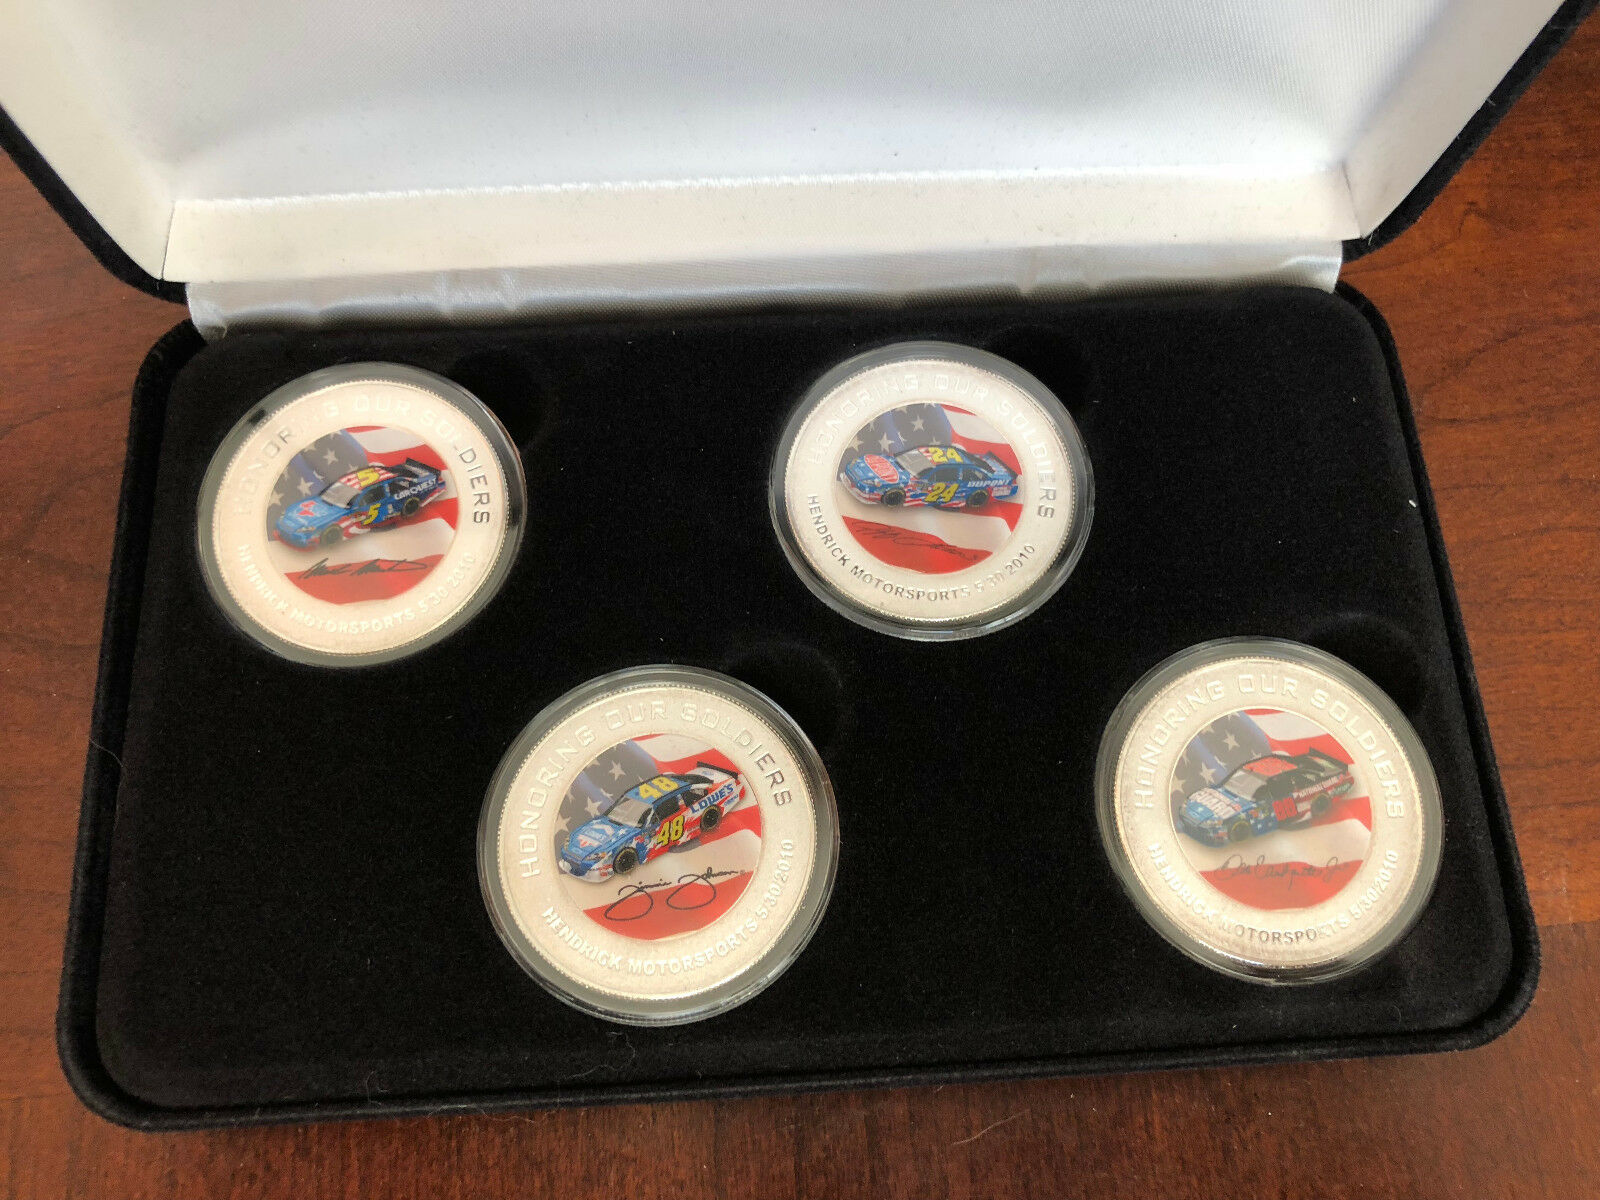 Jimmie Johnson Jeff Gordon Dale Jr HMS Honoring Soldiers SAMPLE plata coin set